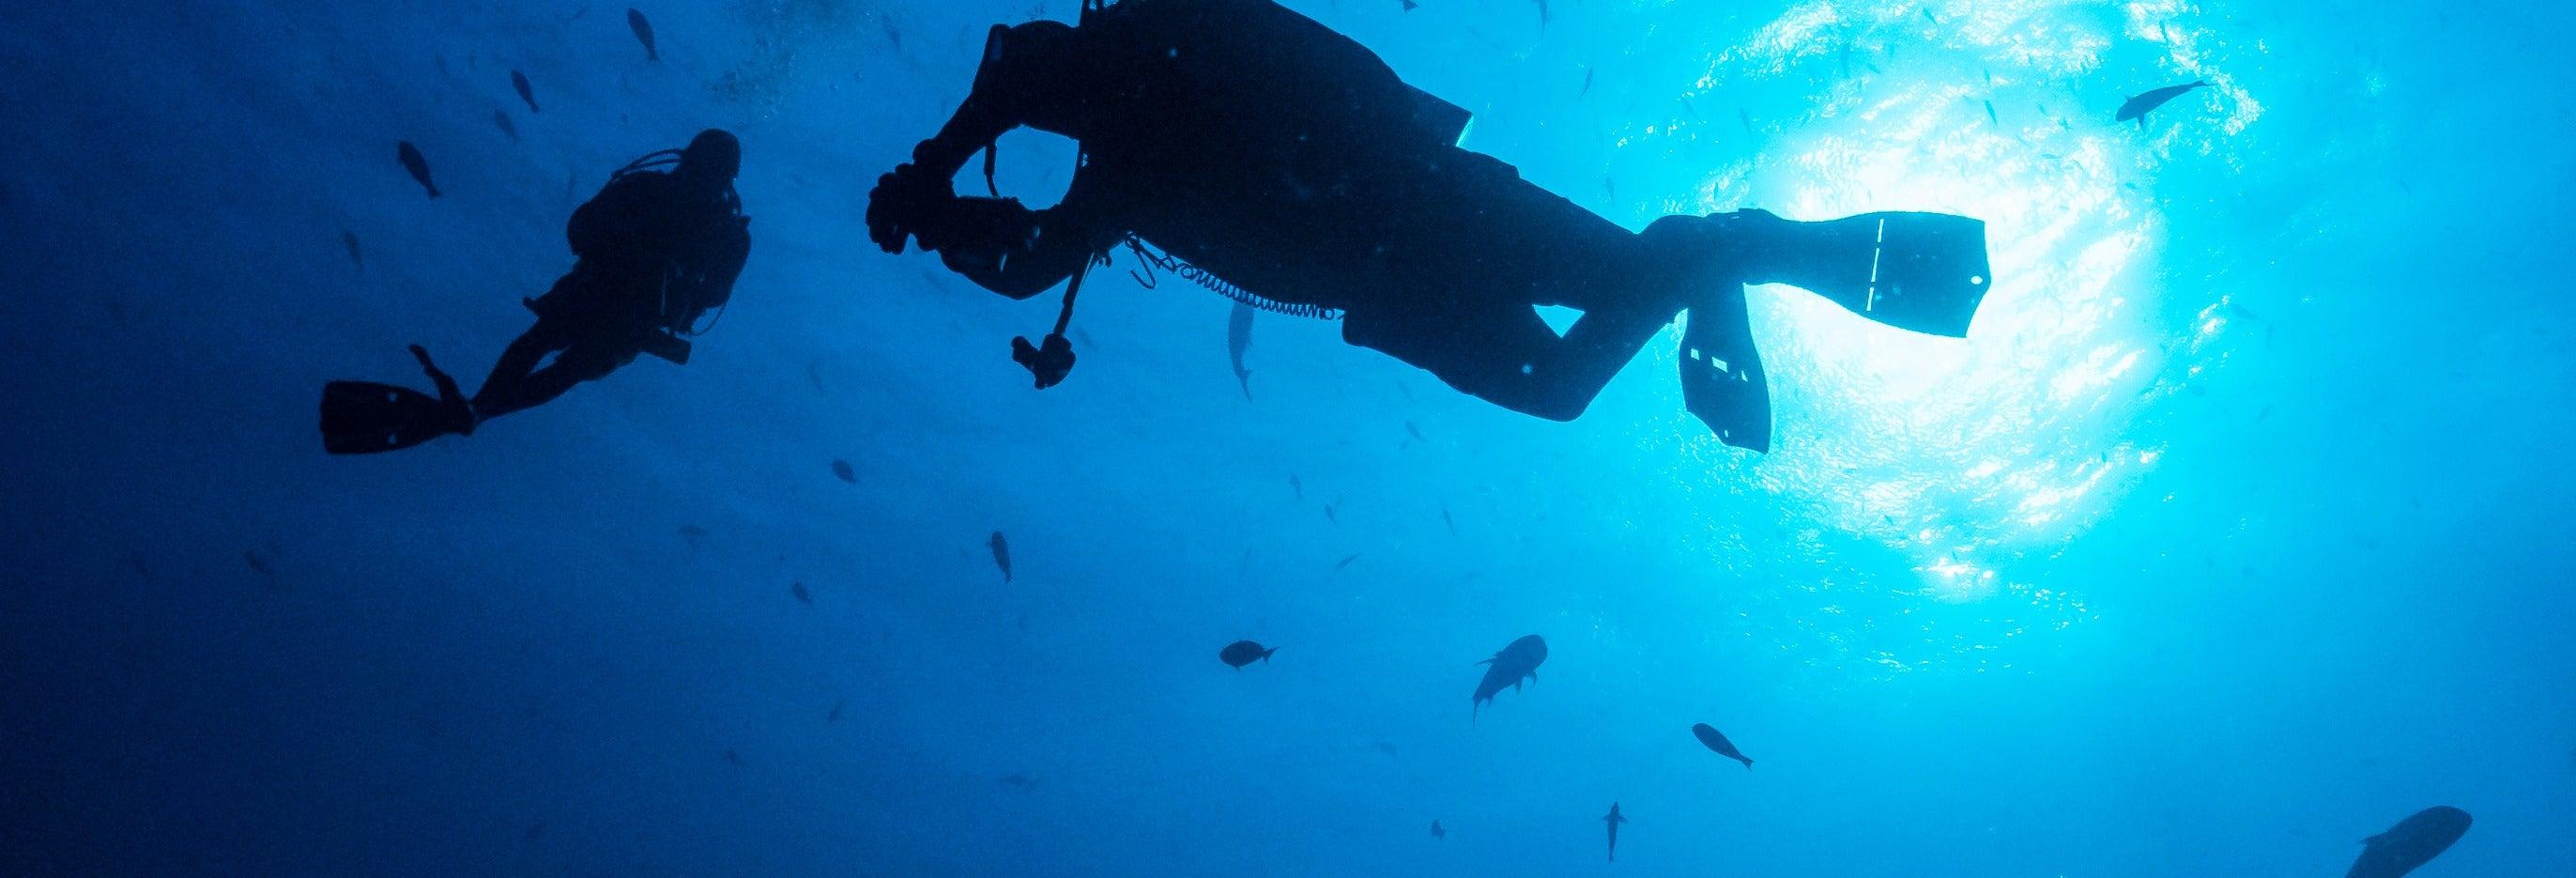 Scuba Diving on Isla del Caño